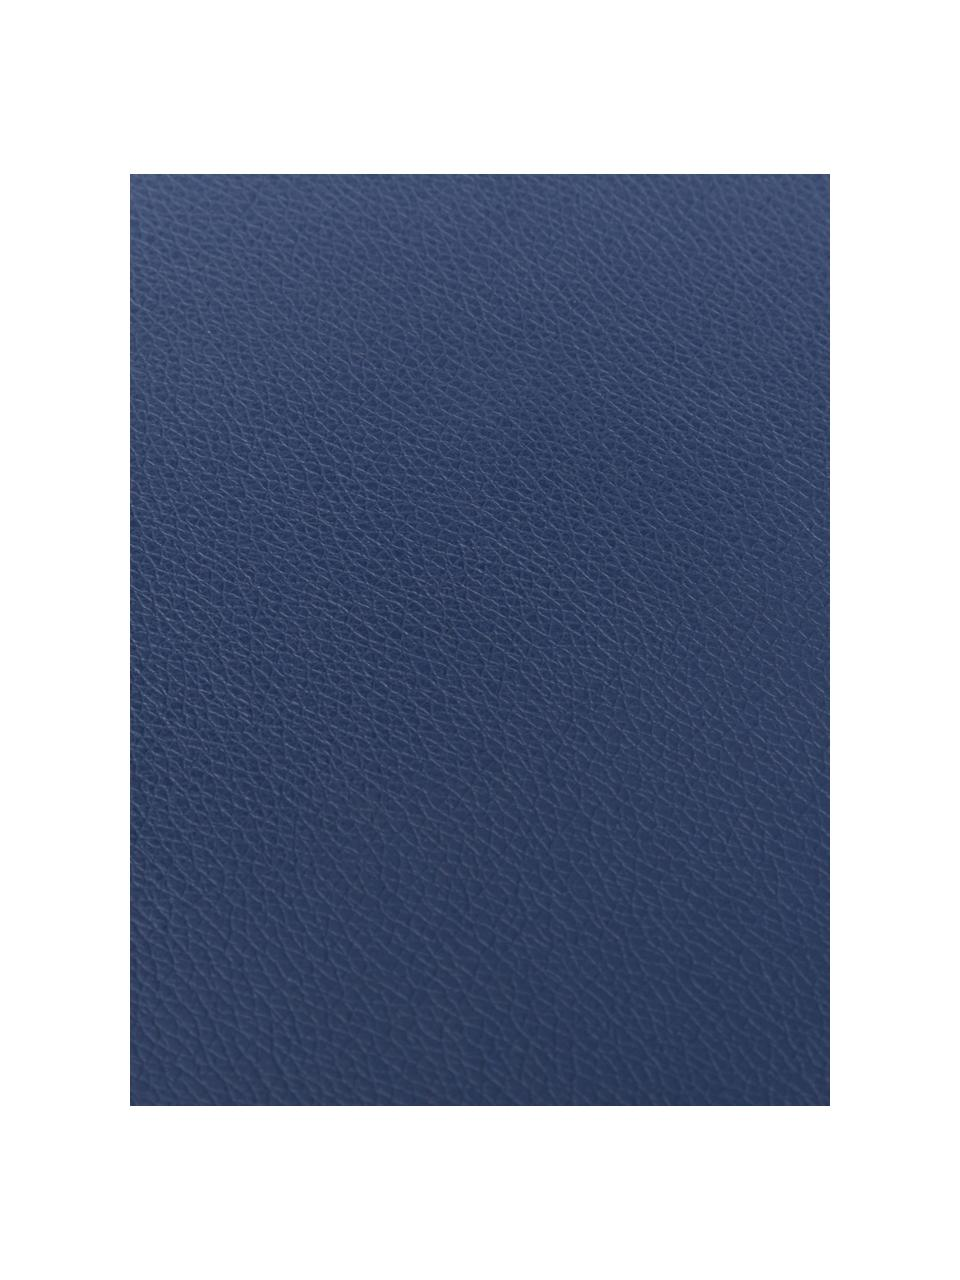 Tovaglietta americana in similpelle Pik 2 pz, Materiale sintetico (PVC), Navy, Larg. 33 x Lung. 46 cm